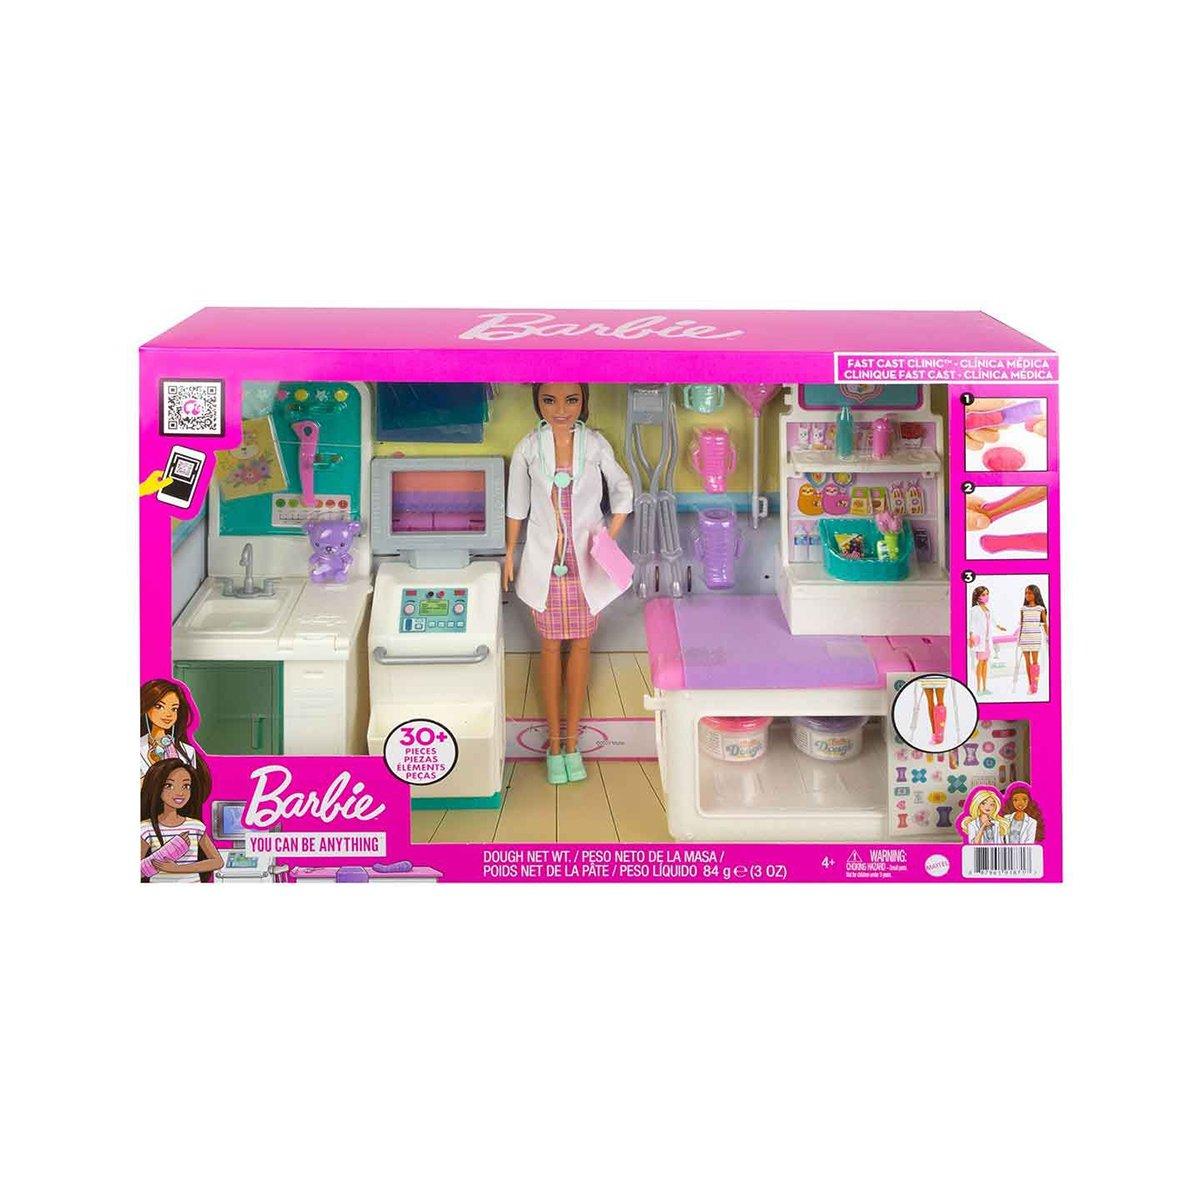 Set Papusa Barbie, Fast Cast Clinic